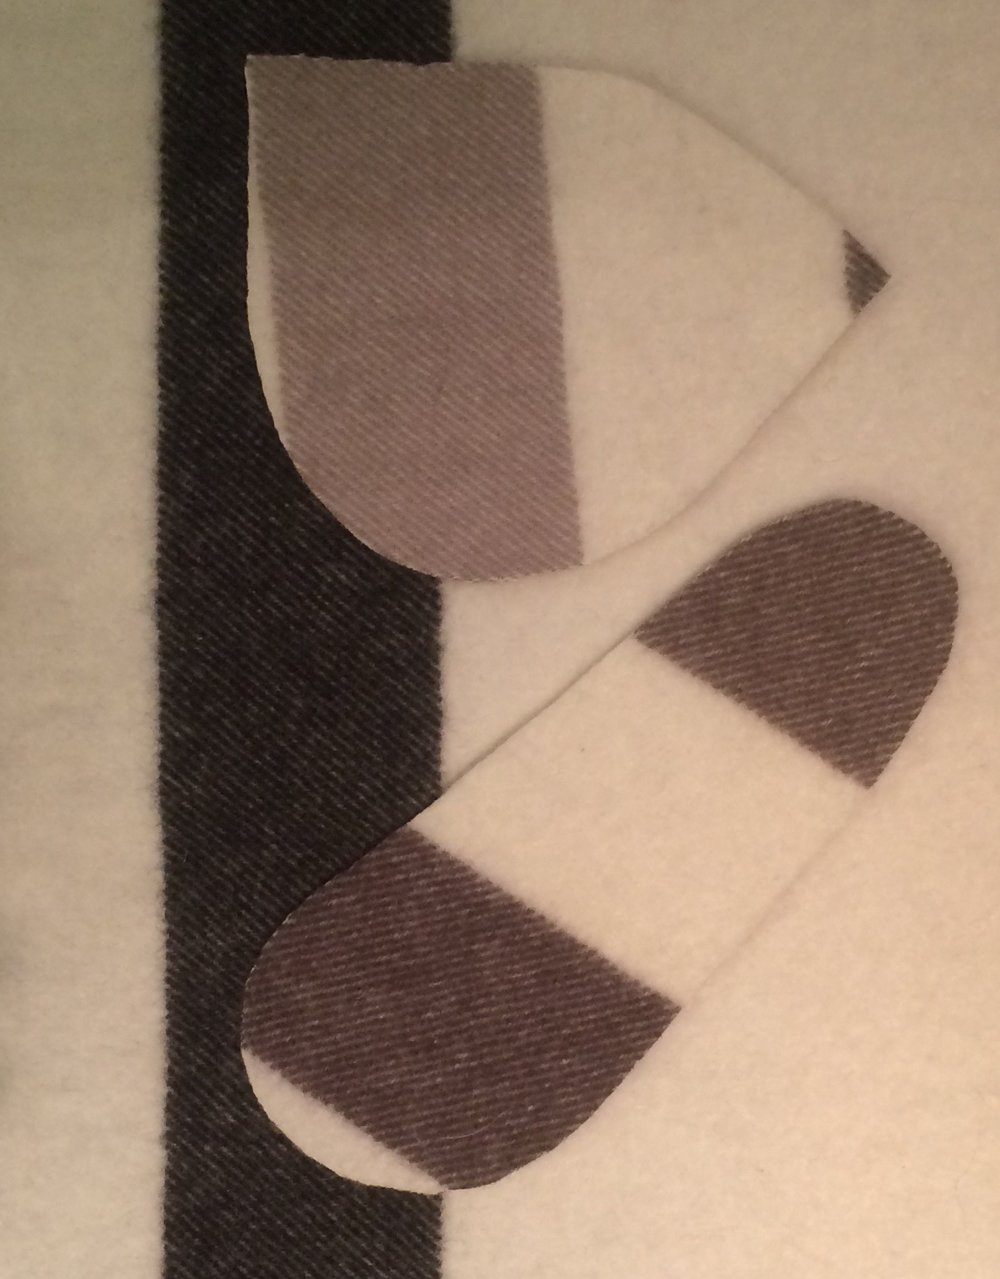 Hudson Bay blanket mukluk liners